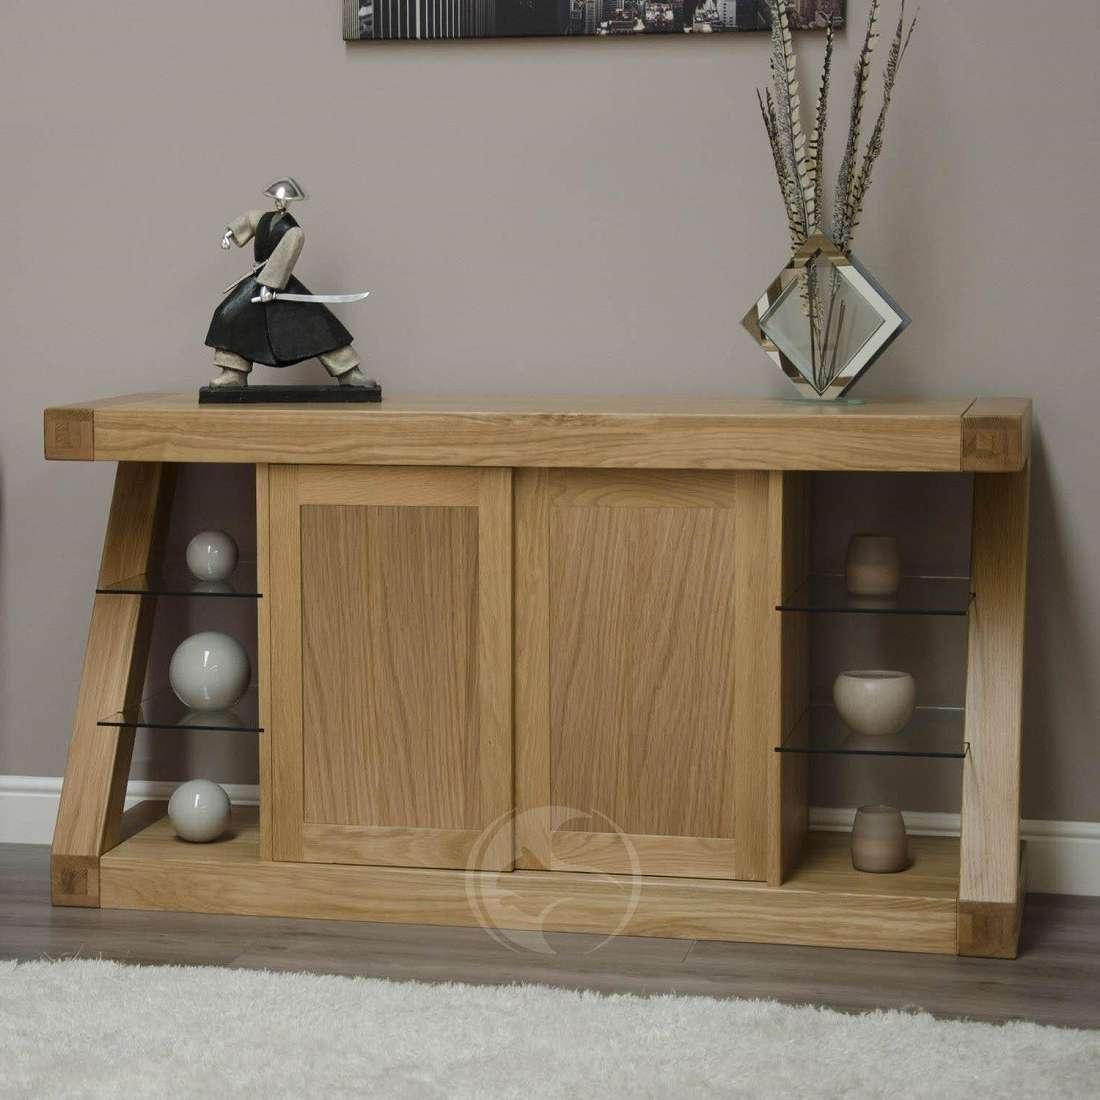 Z Shape Solid Oak Large Sideboard | Oak Furniture Uk With Regard To Large Sideboards (View 9 of 20)